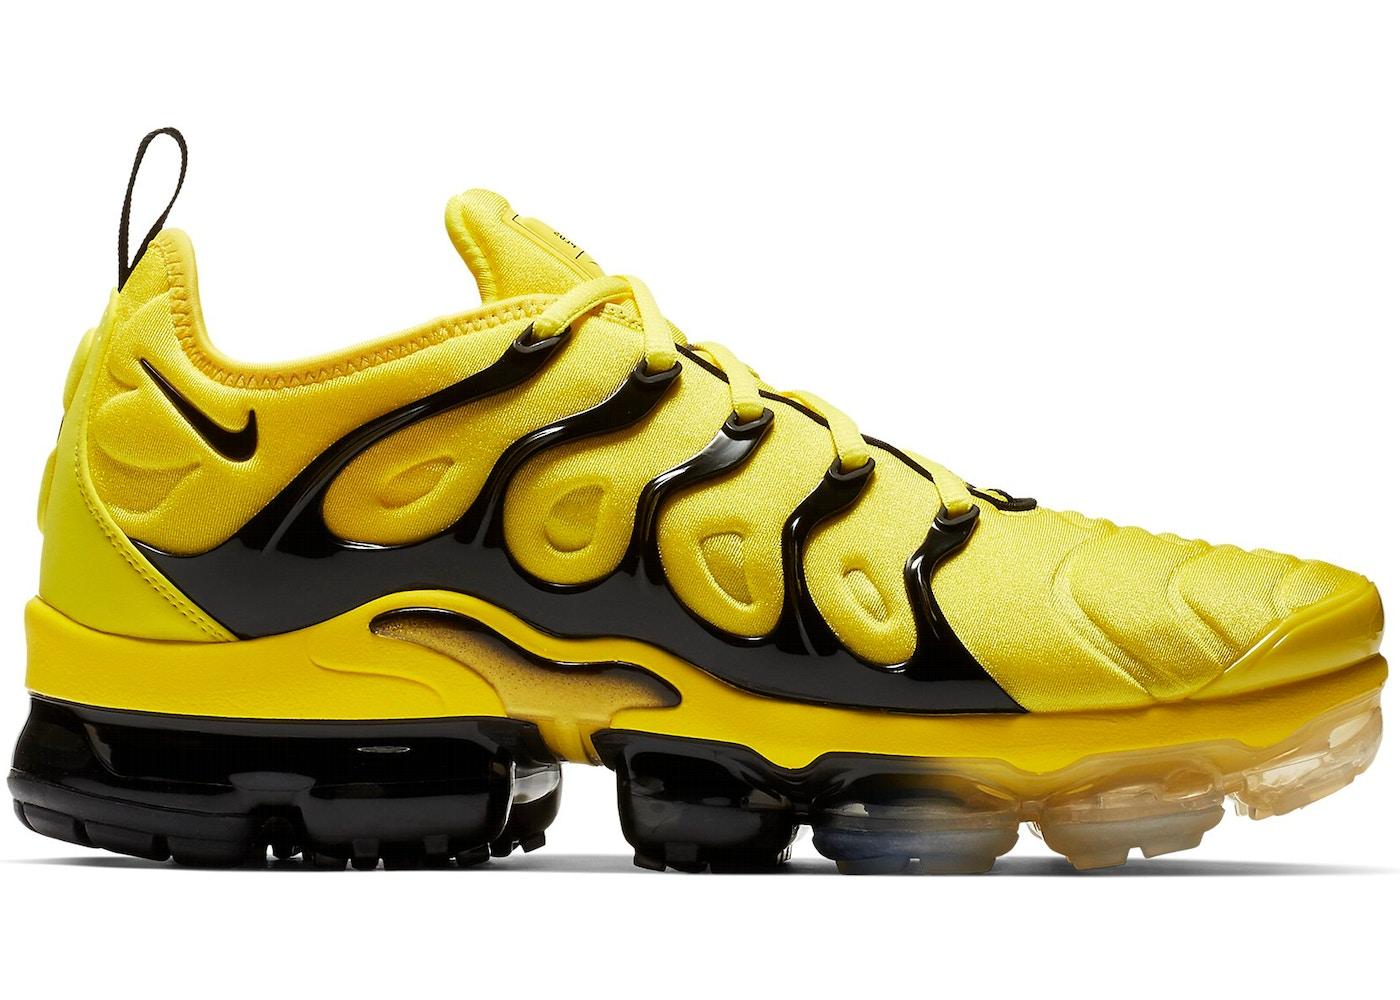 5985b9d05f93 Buy Nike Air Max VaporMax Shoes   Deadstock Sneakers